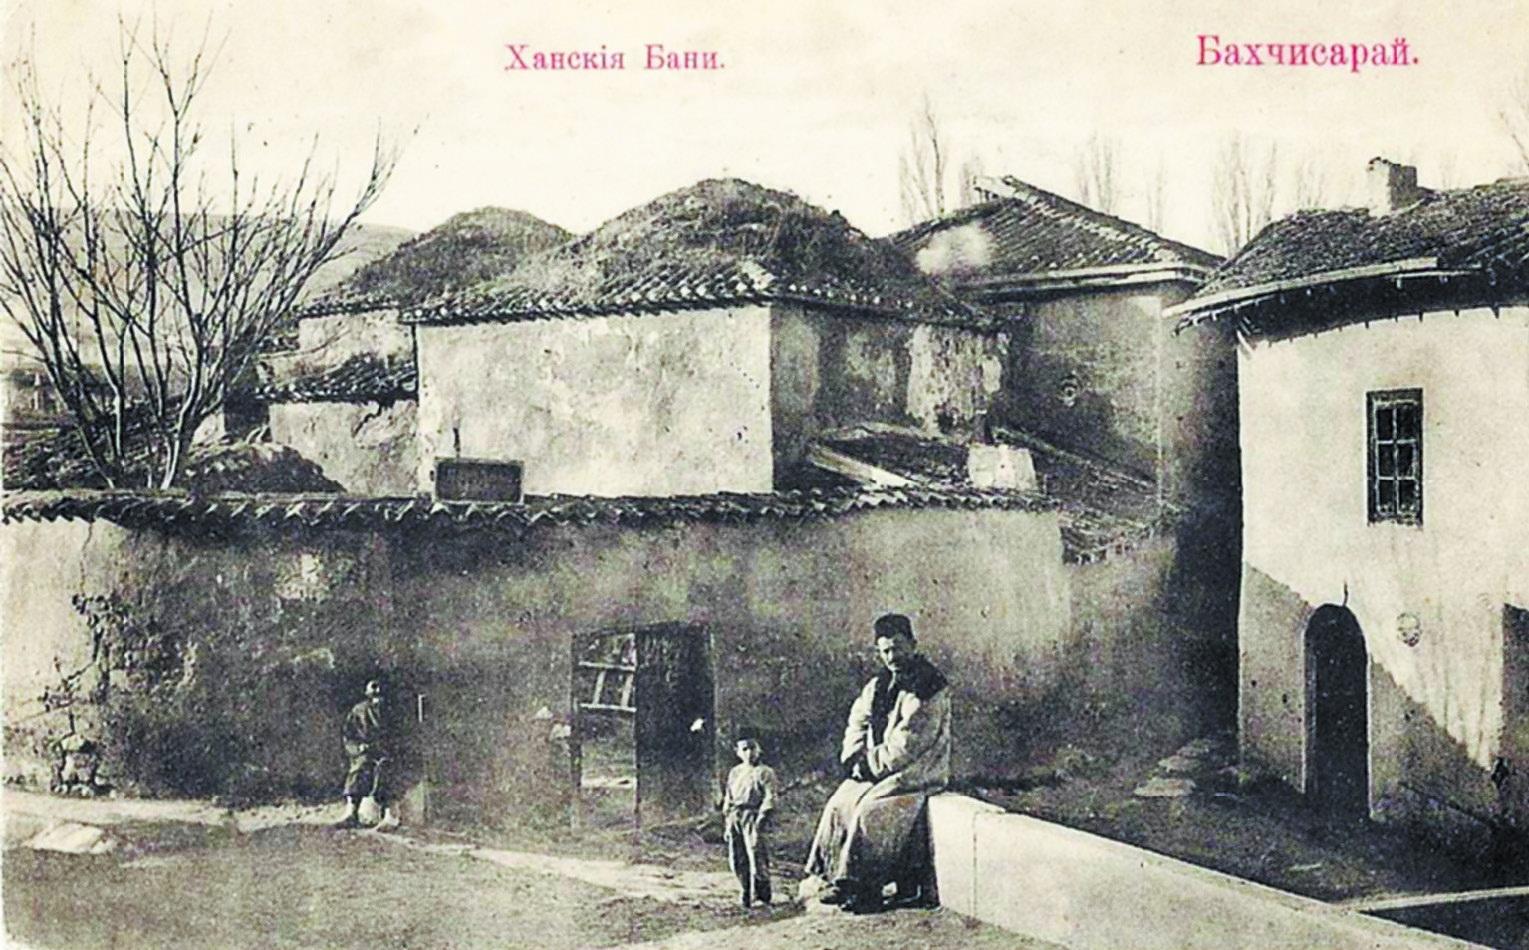 Ханские бани